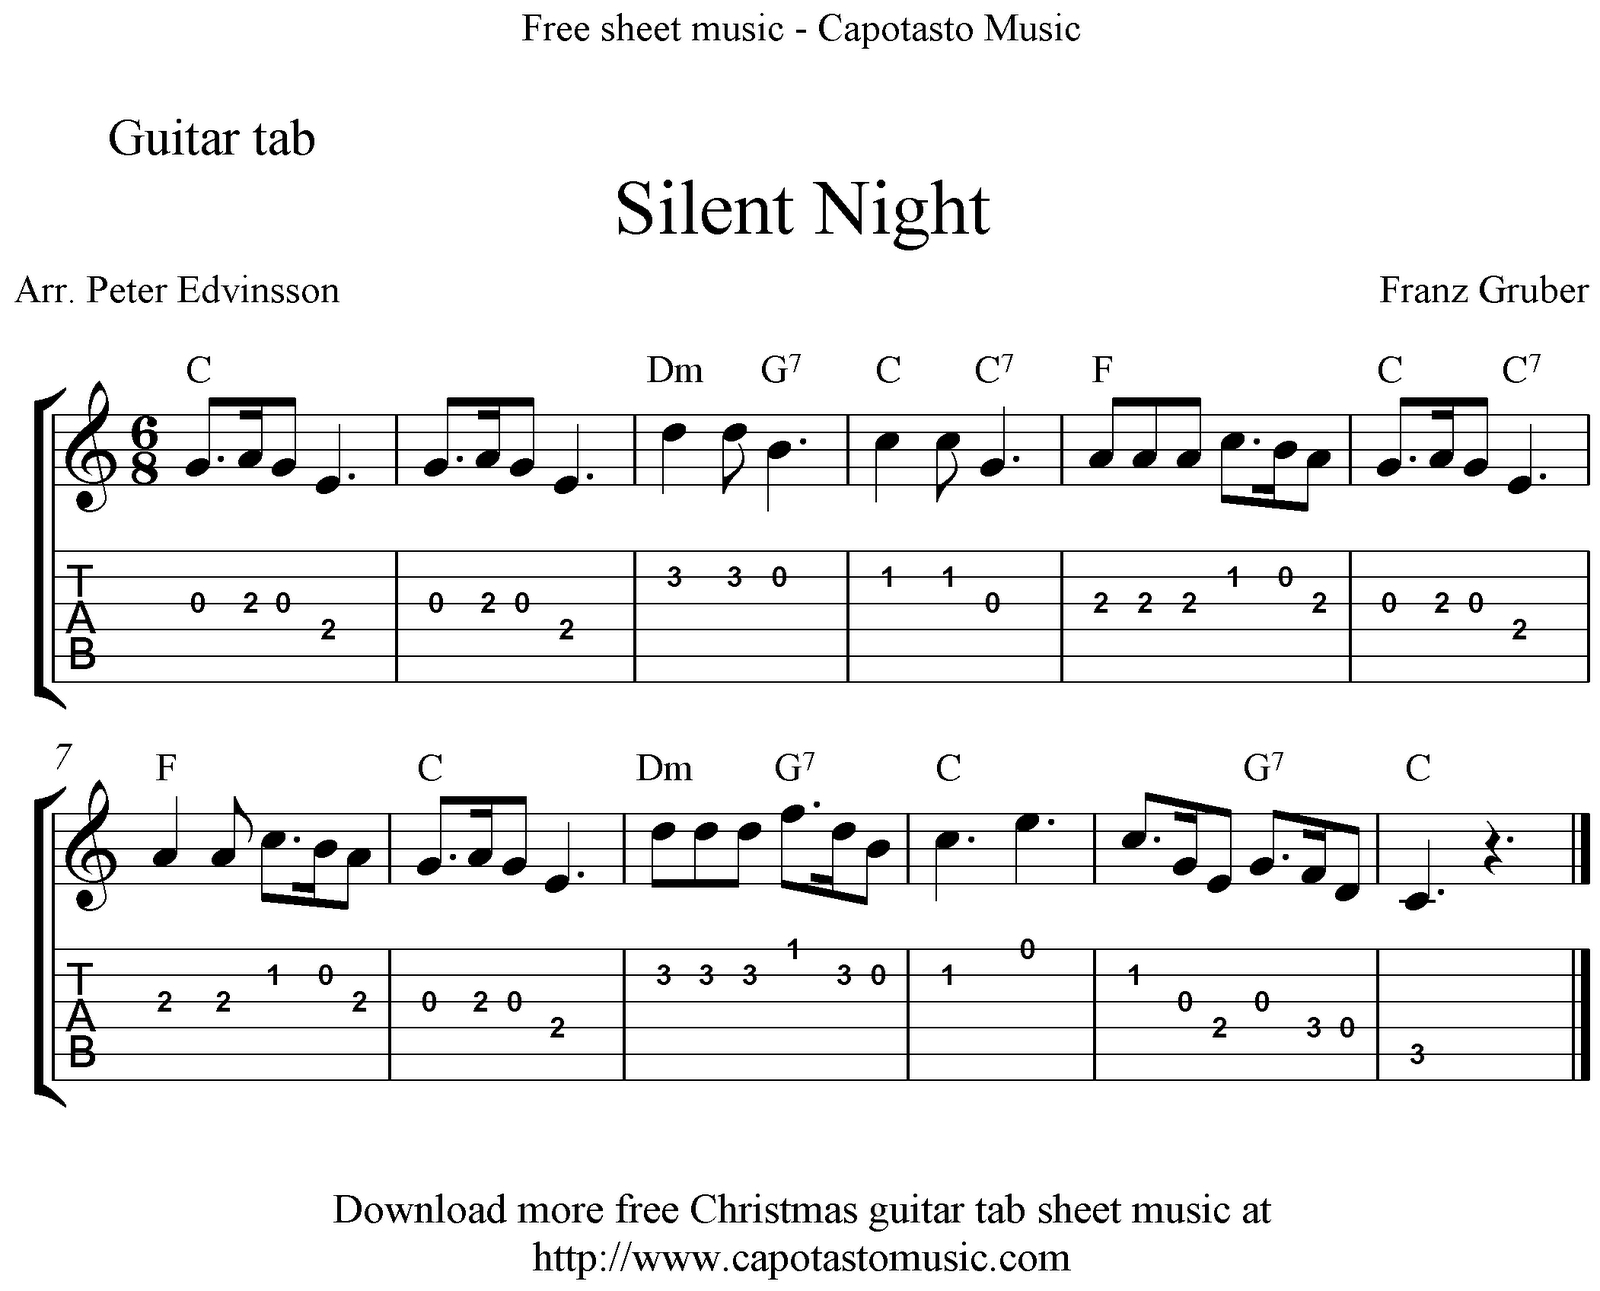 Silent Night, Easy Free Christmas Guitar Tab Sheet Music - Free Printable Guitar Tabs For Beginners